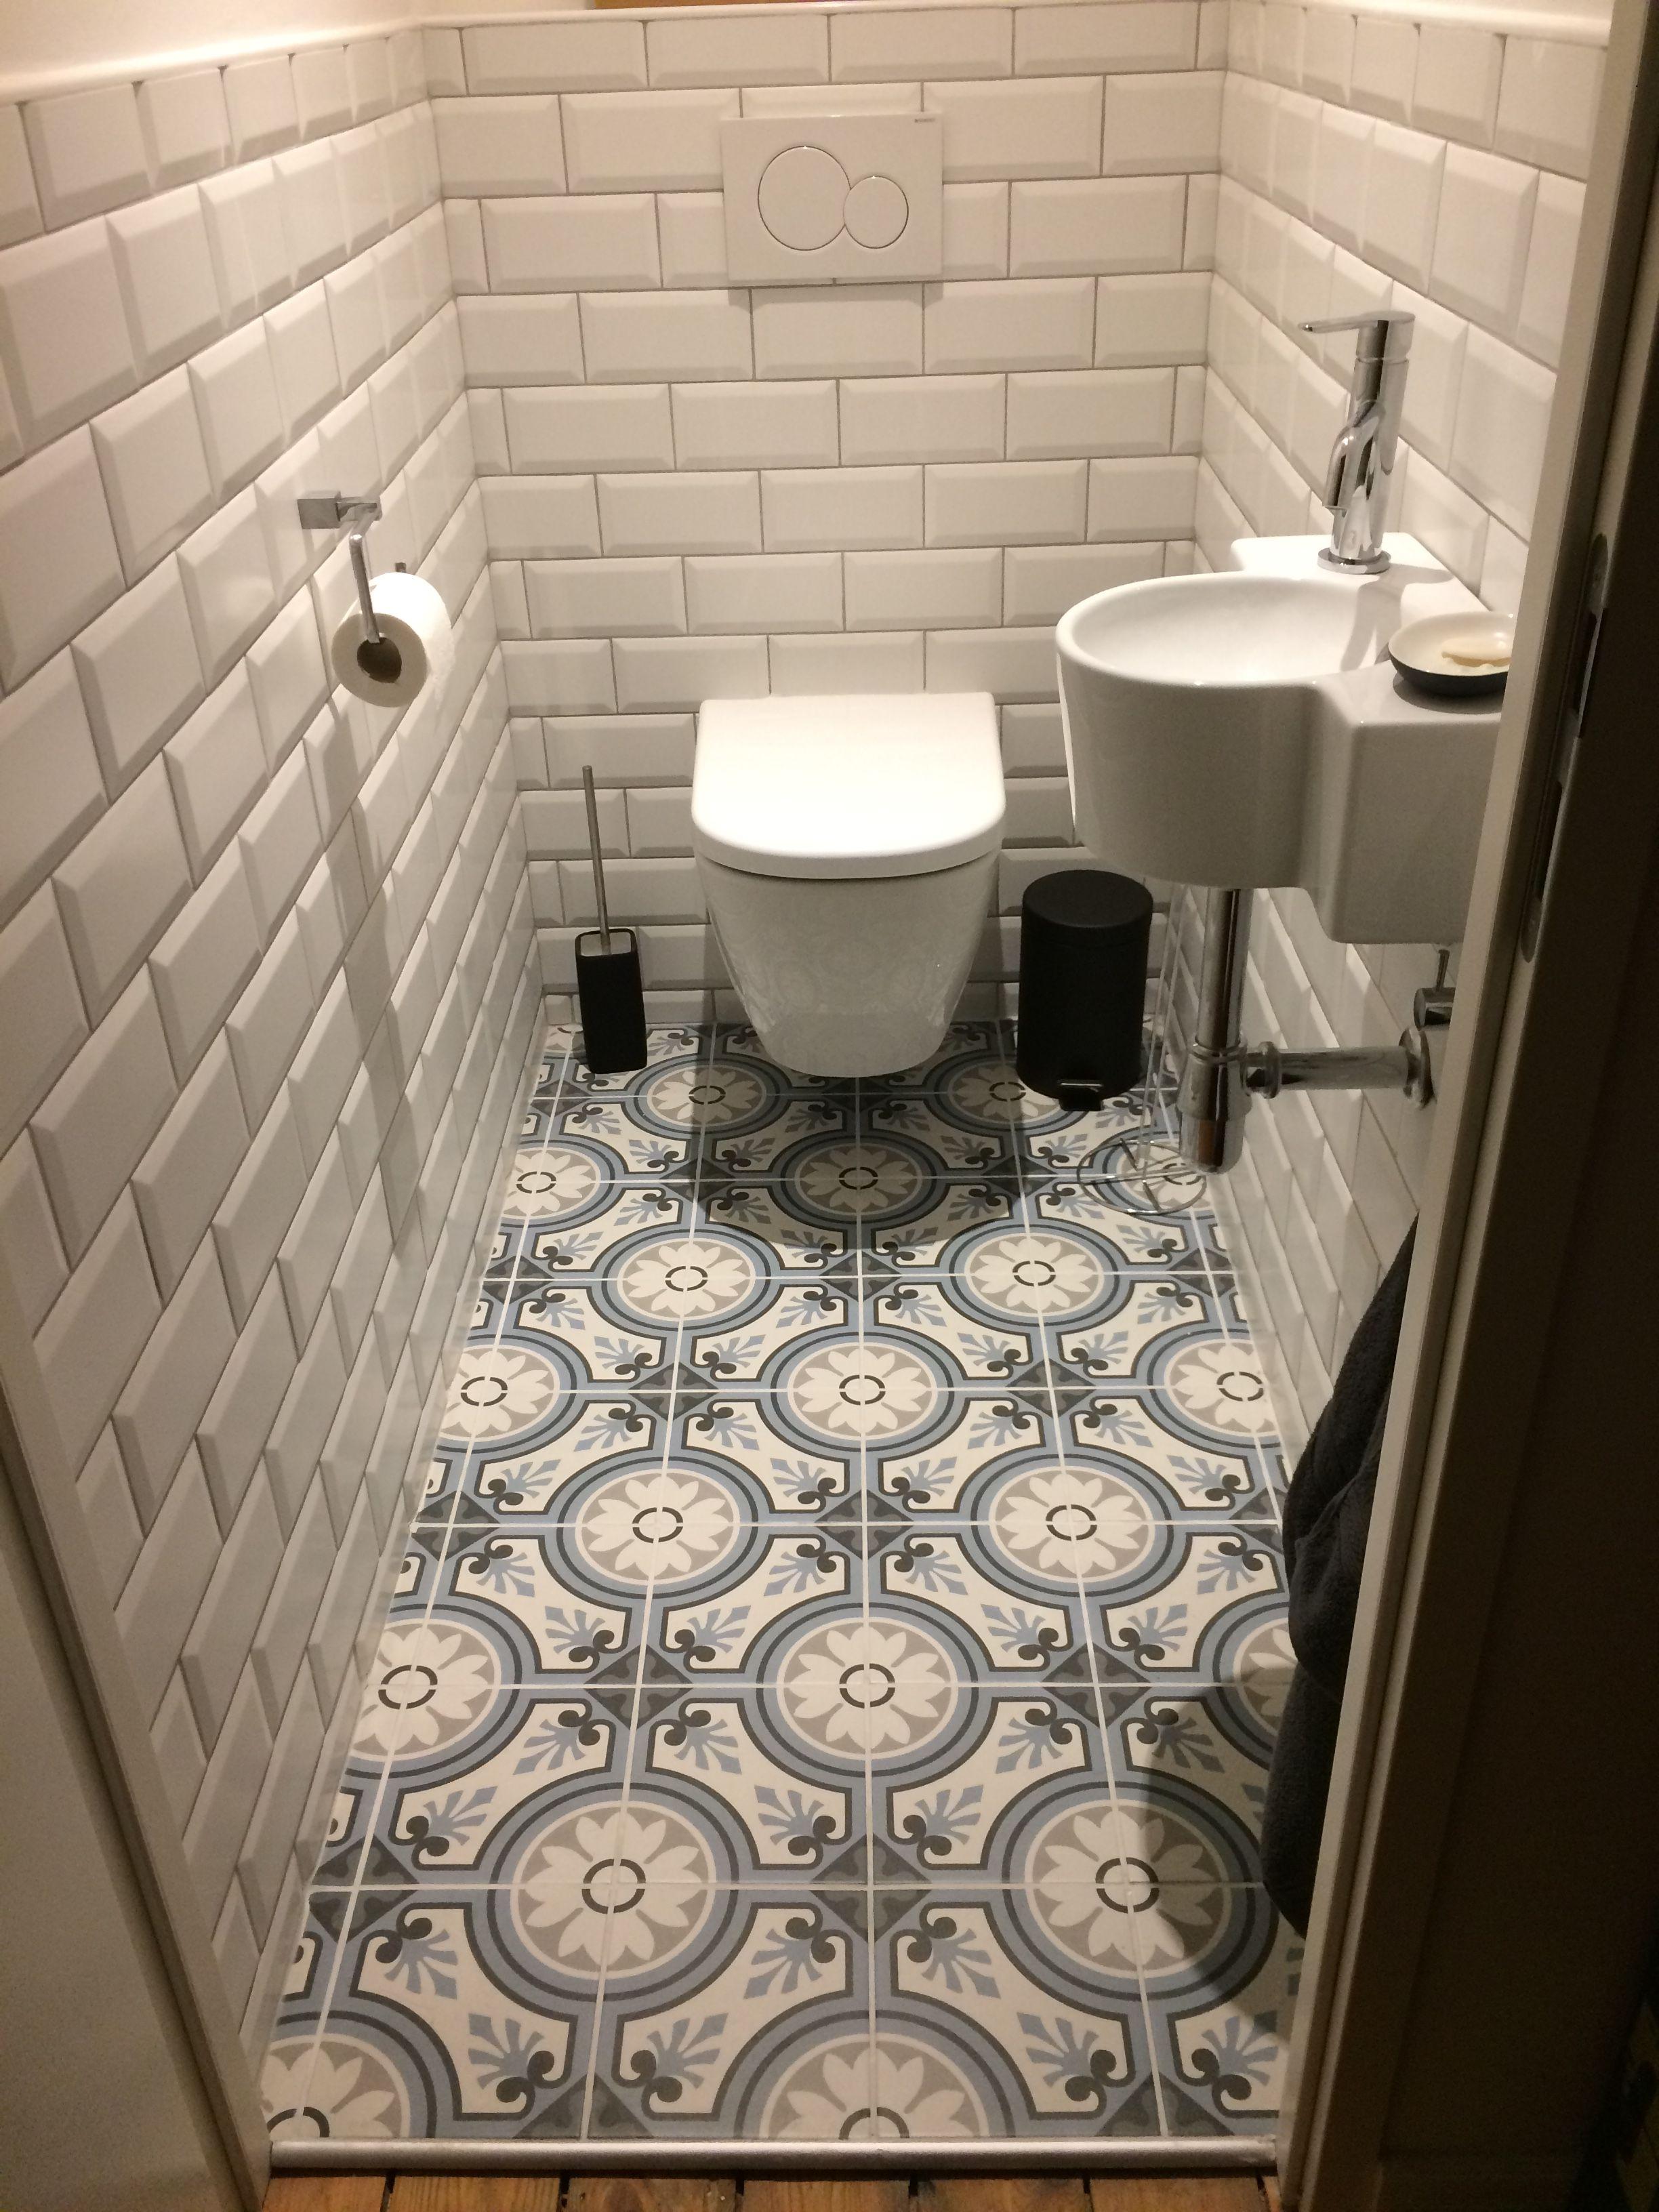 Toilette Carrelage | Toilette Carrelage Blanc Oveetech